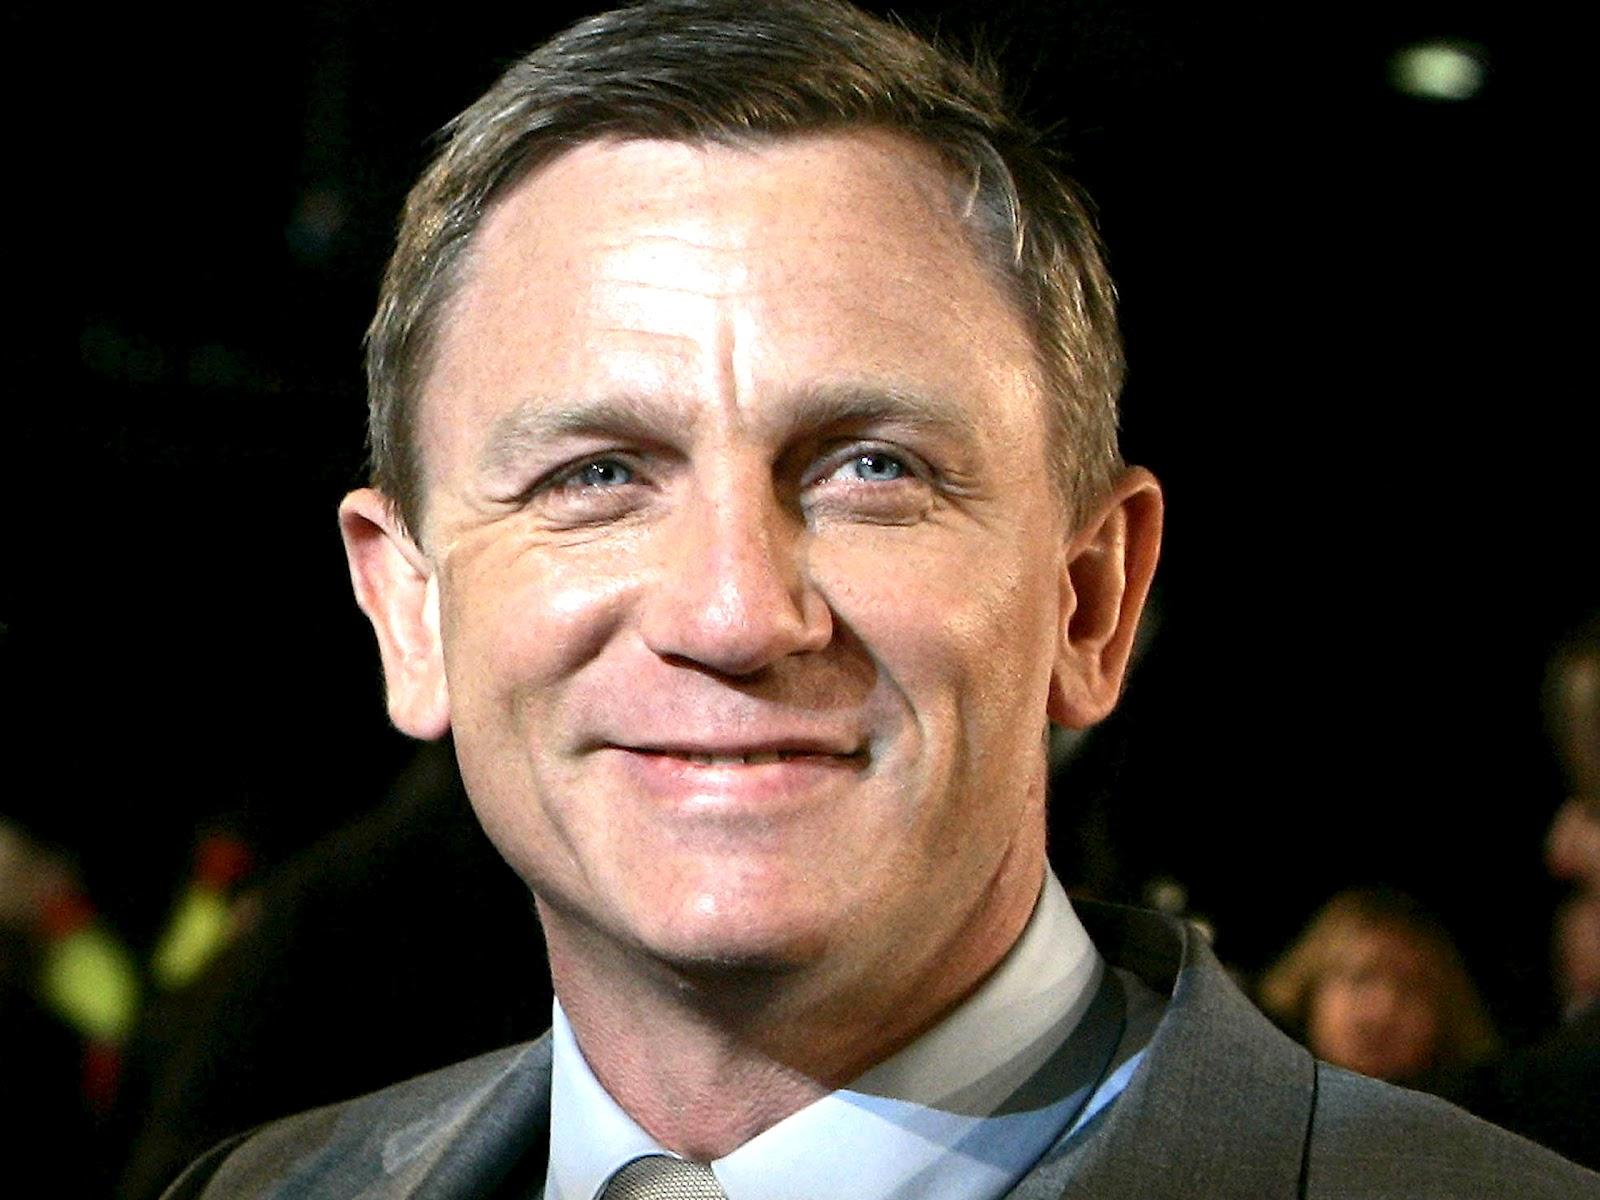 Daniel Craig England Best Actor Profile And Photos 2012